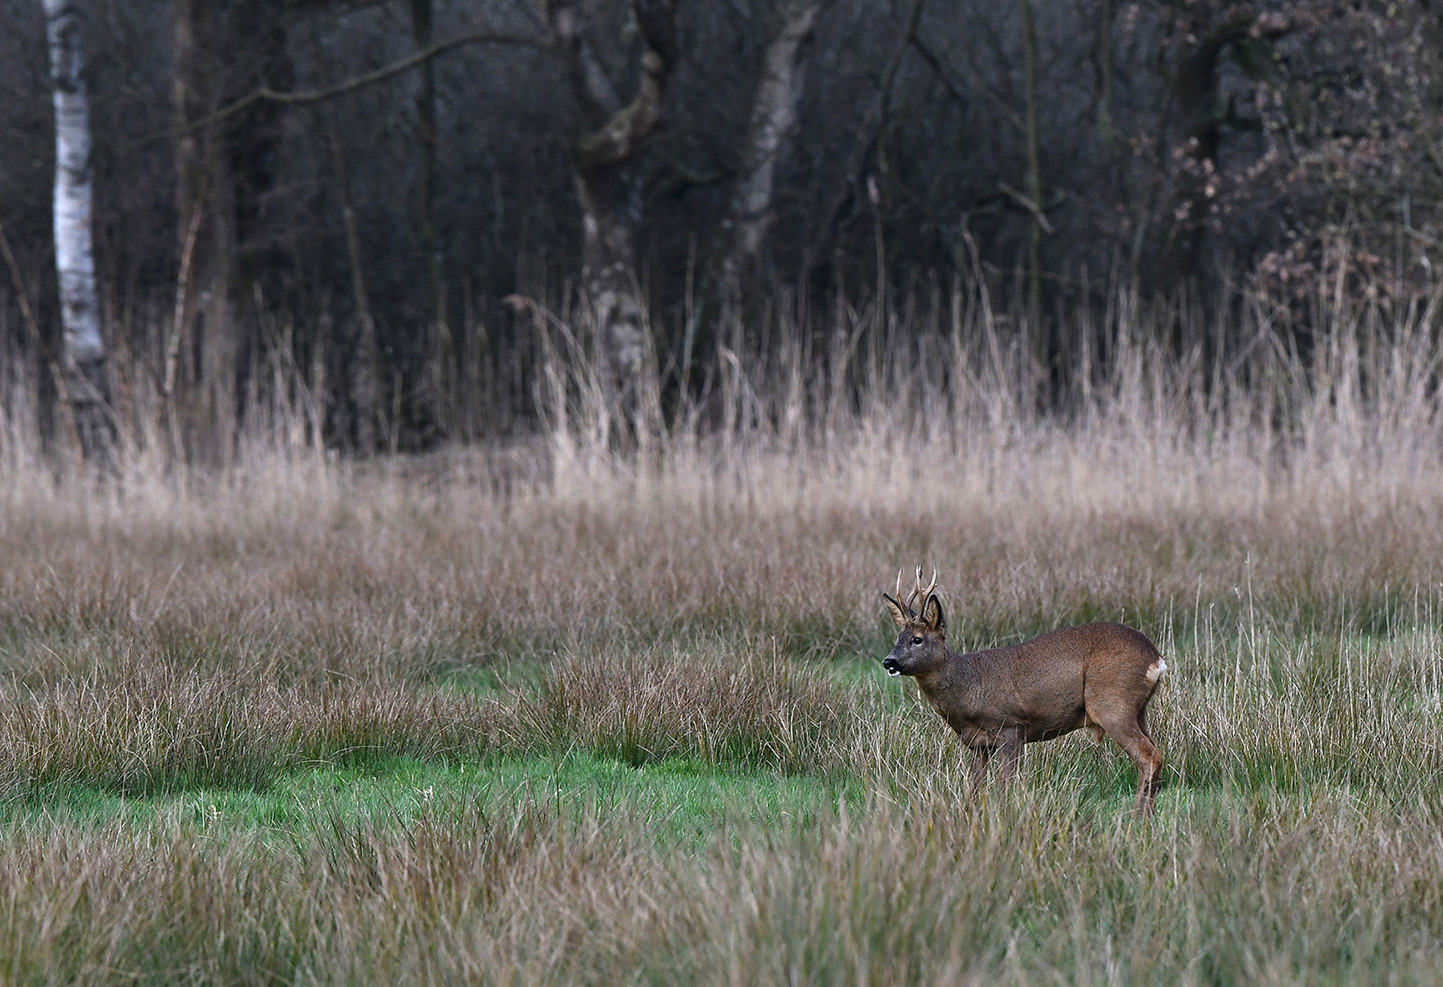 Daar stond ineens de bekende reebok Pollux II in het veld – Foto: ©Louis Fraanje